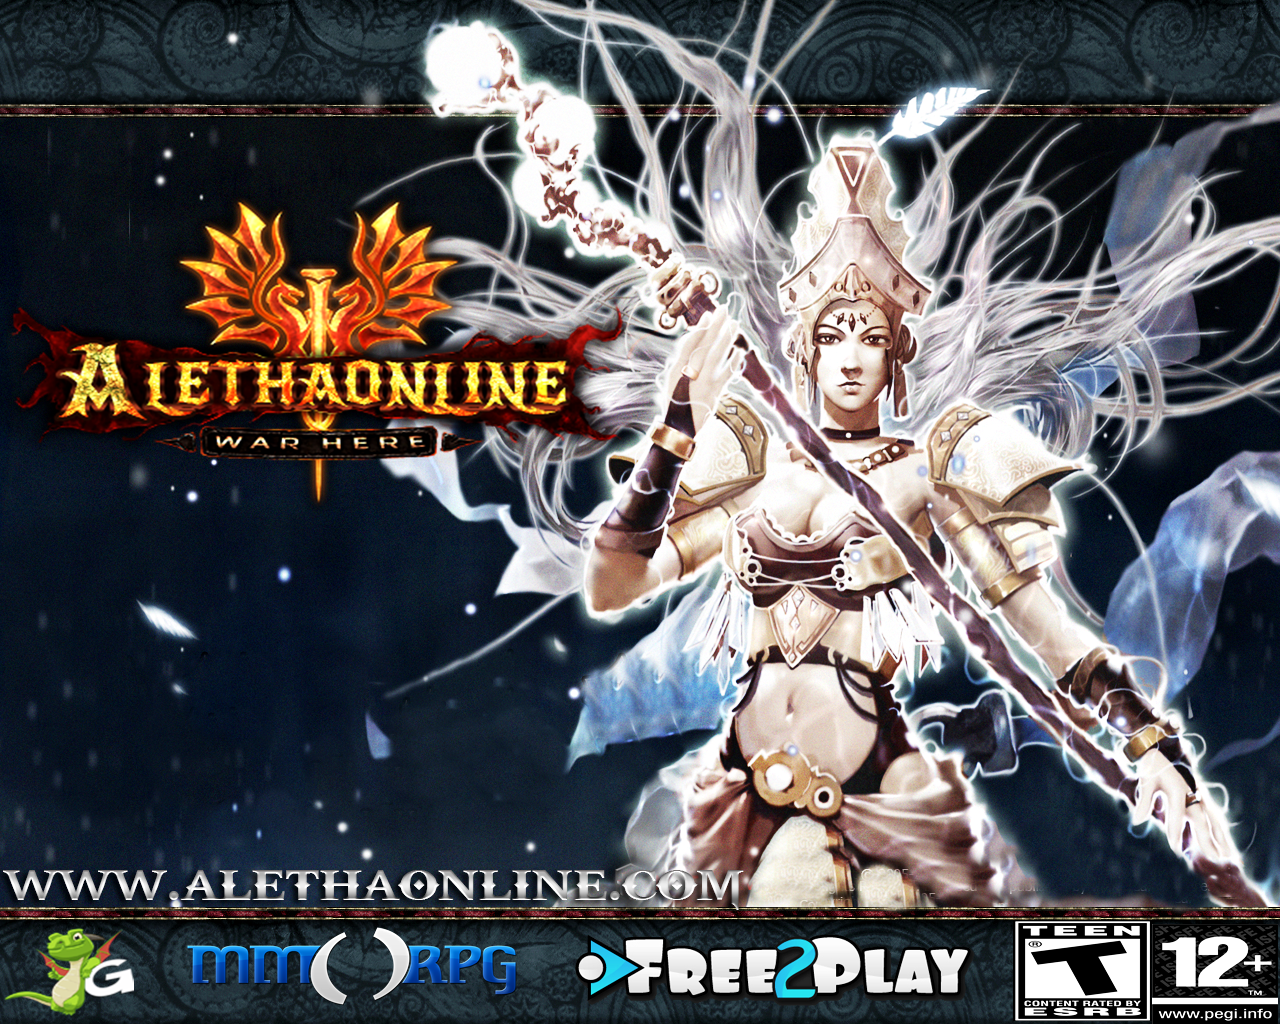 Aletha online ''v2090'' yeni sunucu sphere beta online!